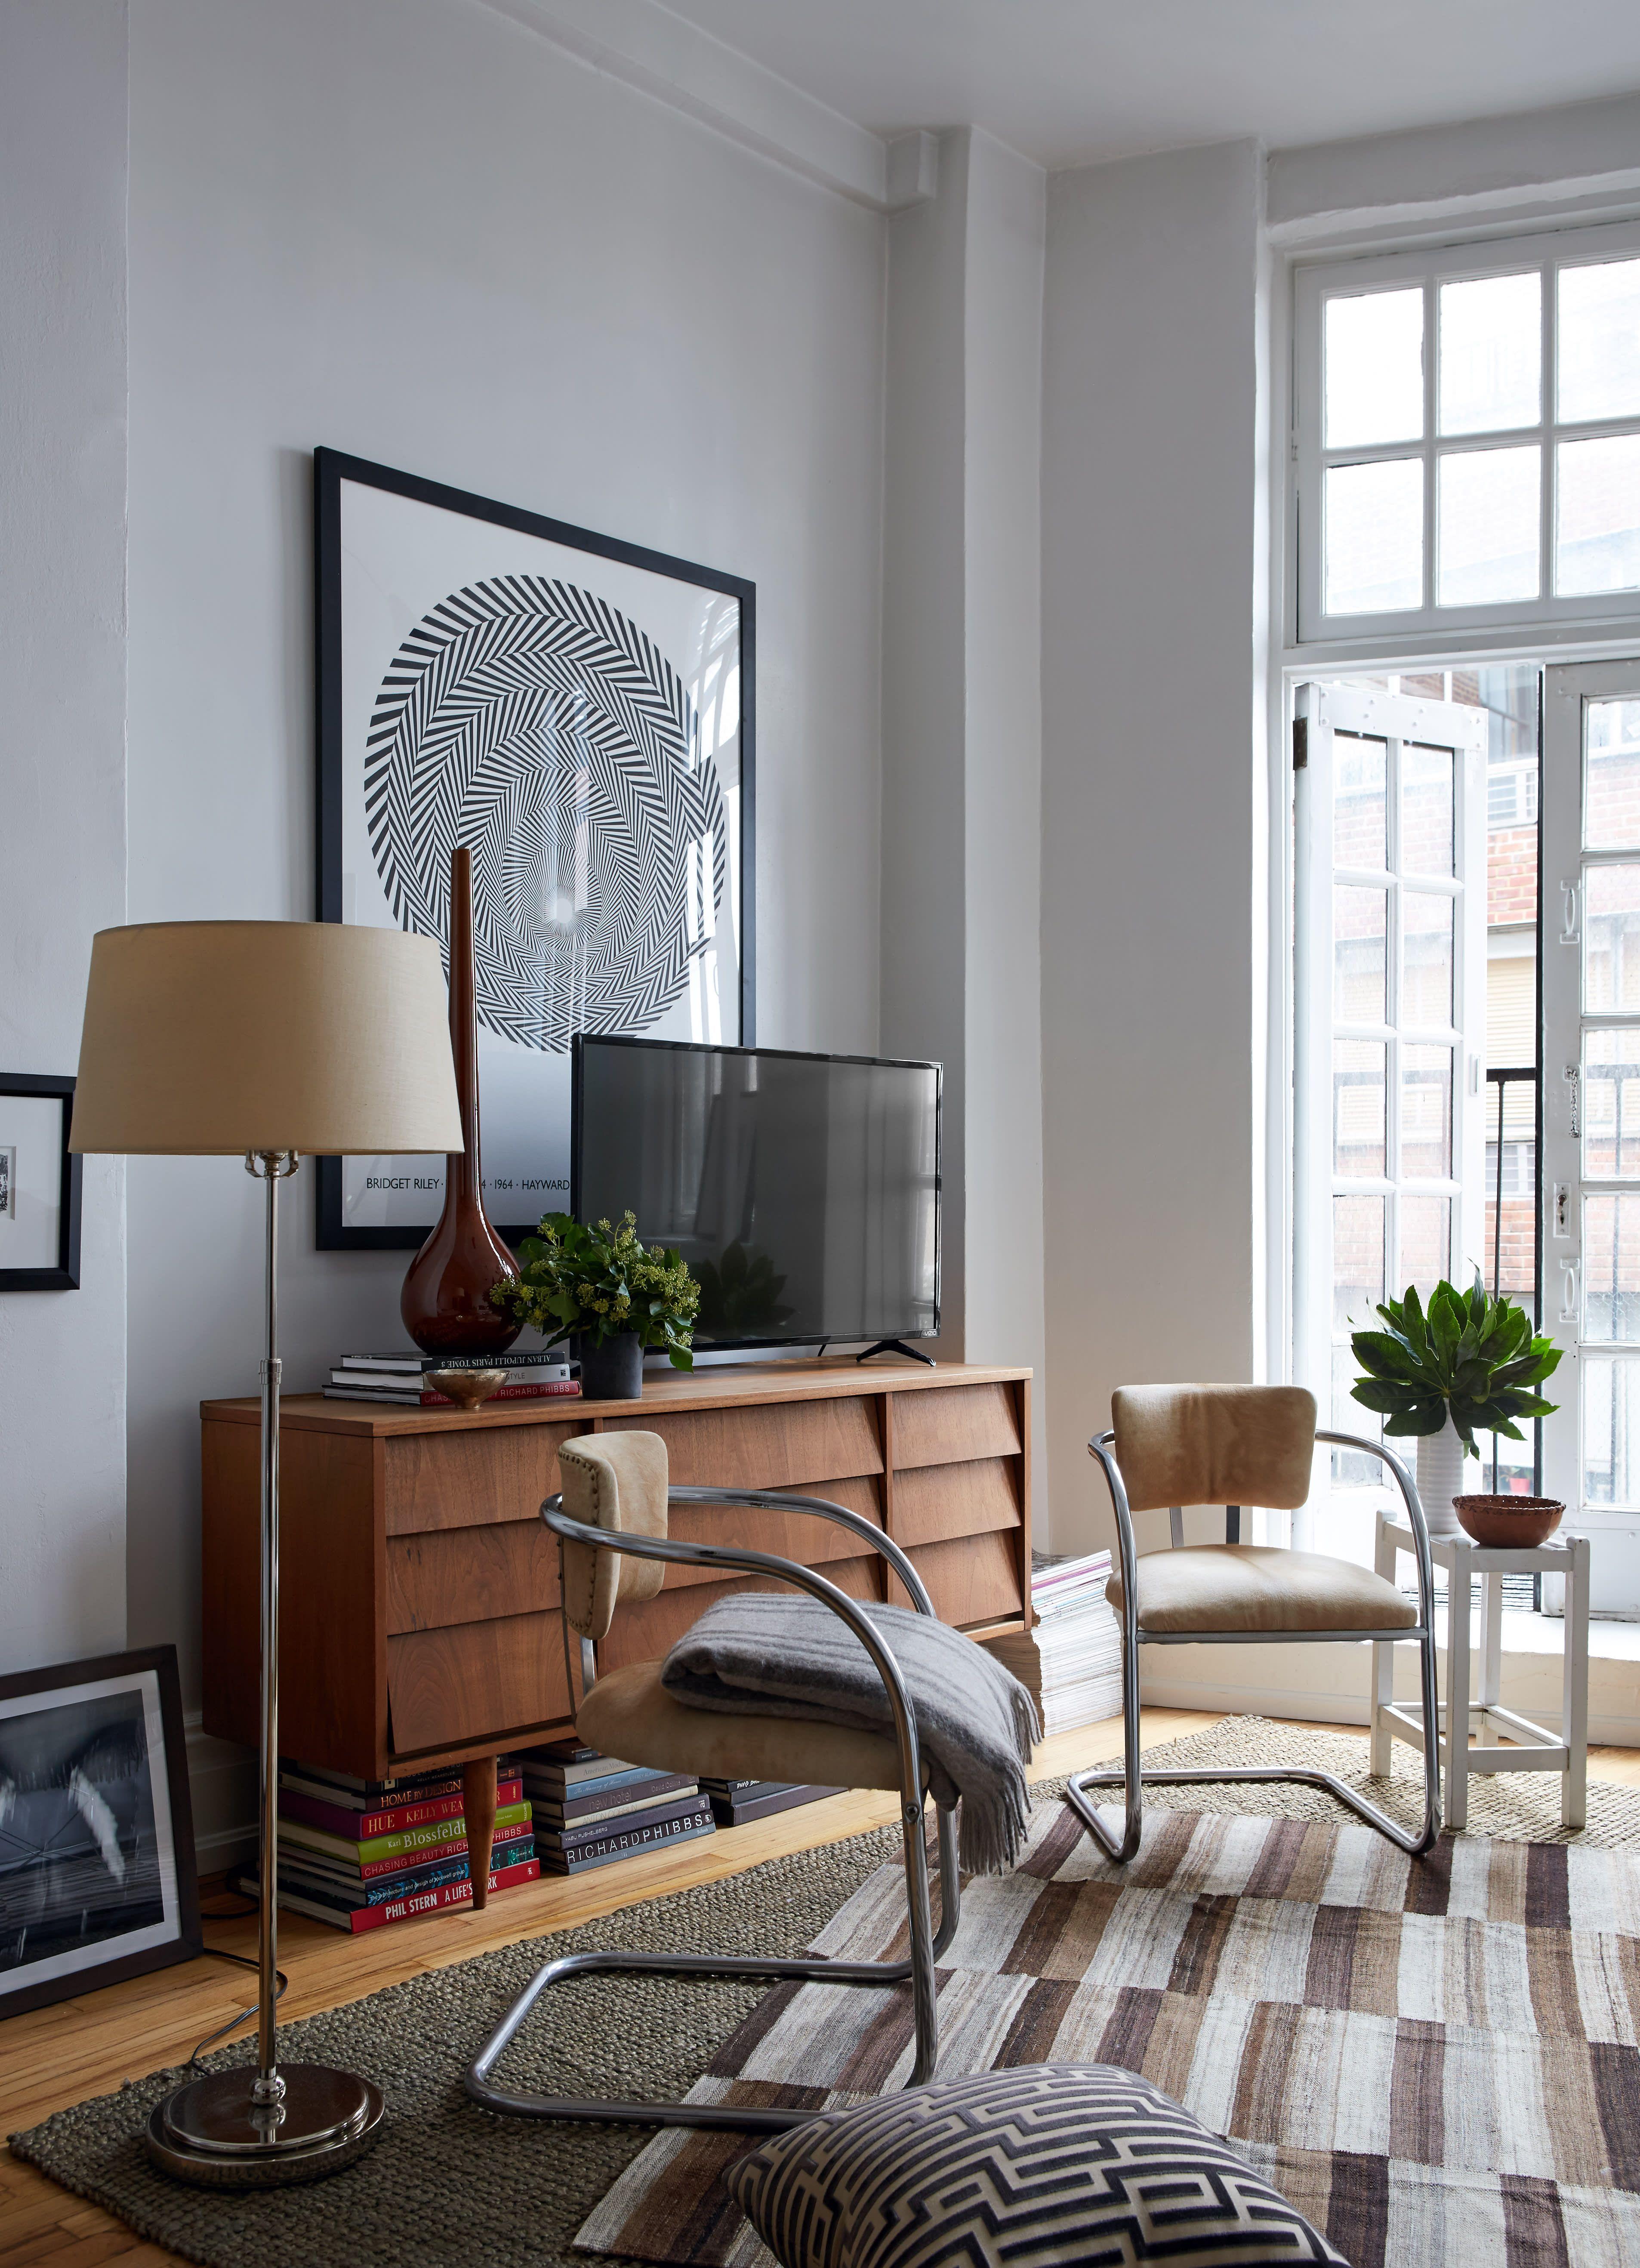 Step Inside Interior Designer Dan Mazzarini S Apartment In New York City Minimalist Living Room Decor Small Apartment Decorating Living Room Minimalist Living Room #step #by #step #decorating #living #room